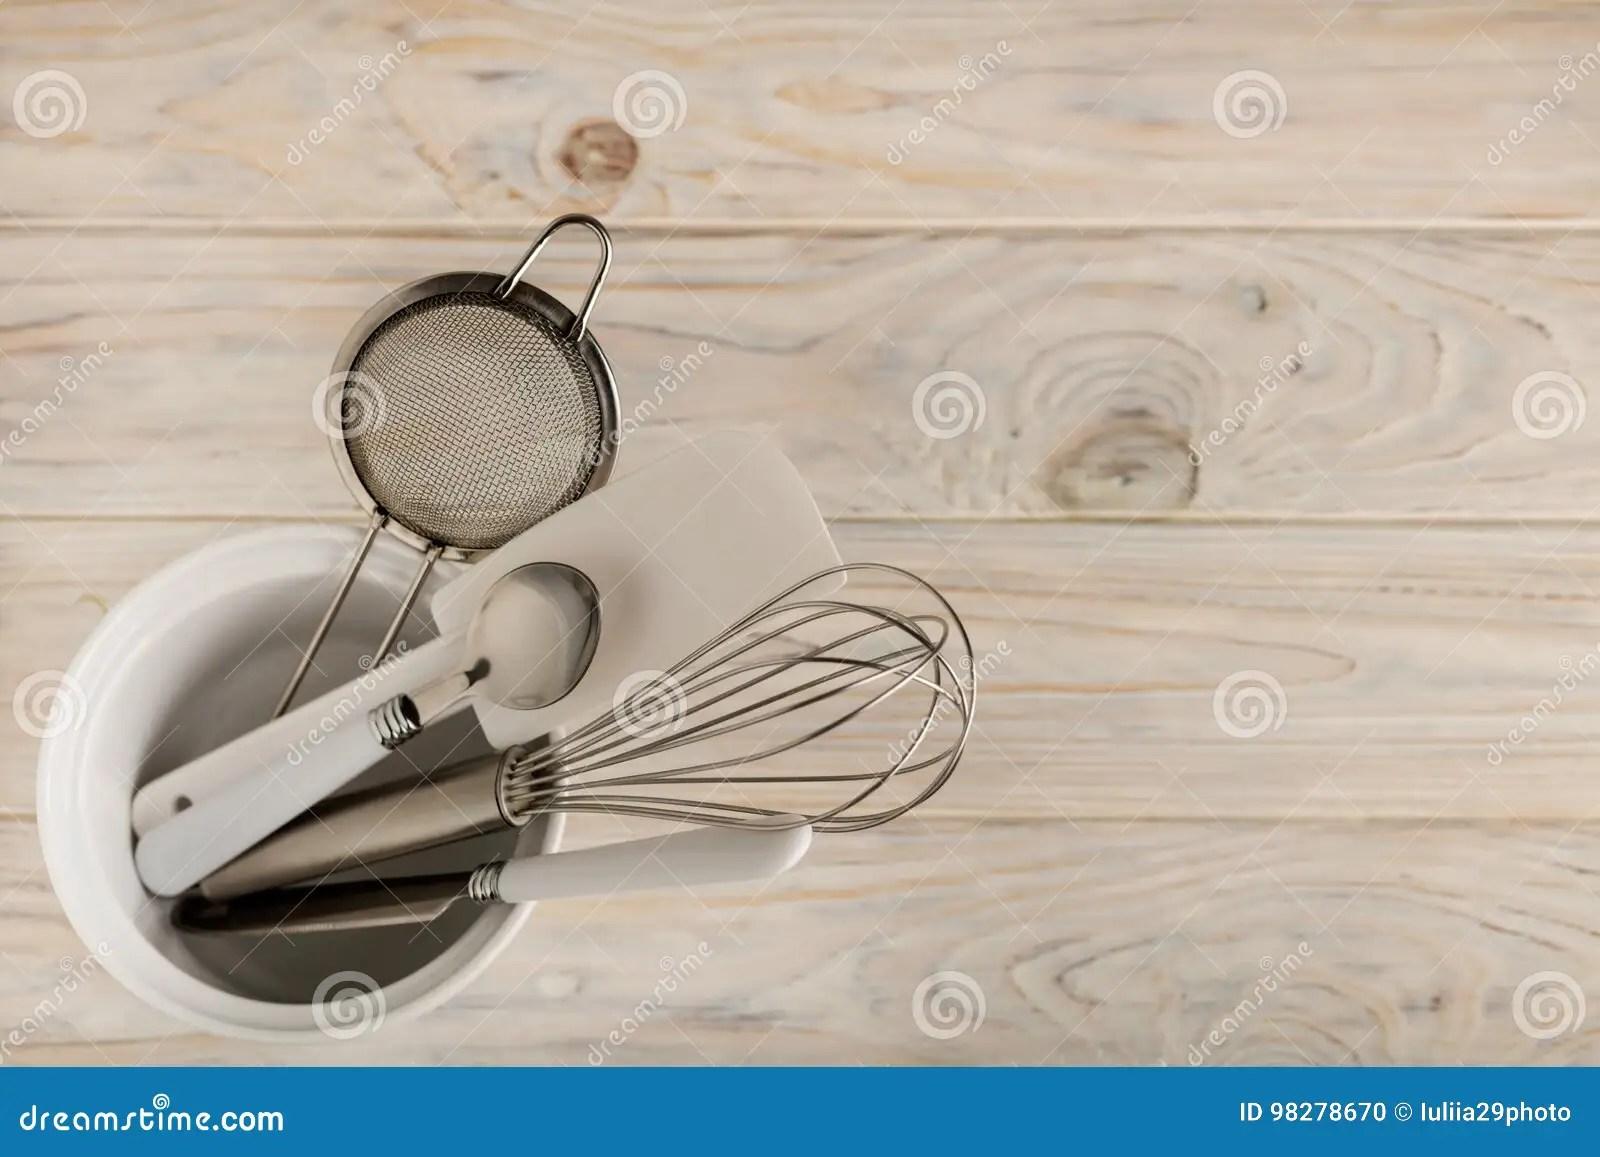 kitchen aid knives wooden stools 白色和钢颜色辅助部件厨房工具为烘烤库存照片 图片包括有陶器 刀叉餐具 白色和钢颜色辅助部件厨房工具为烘烤